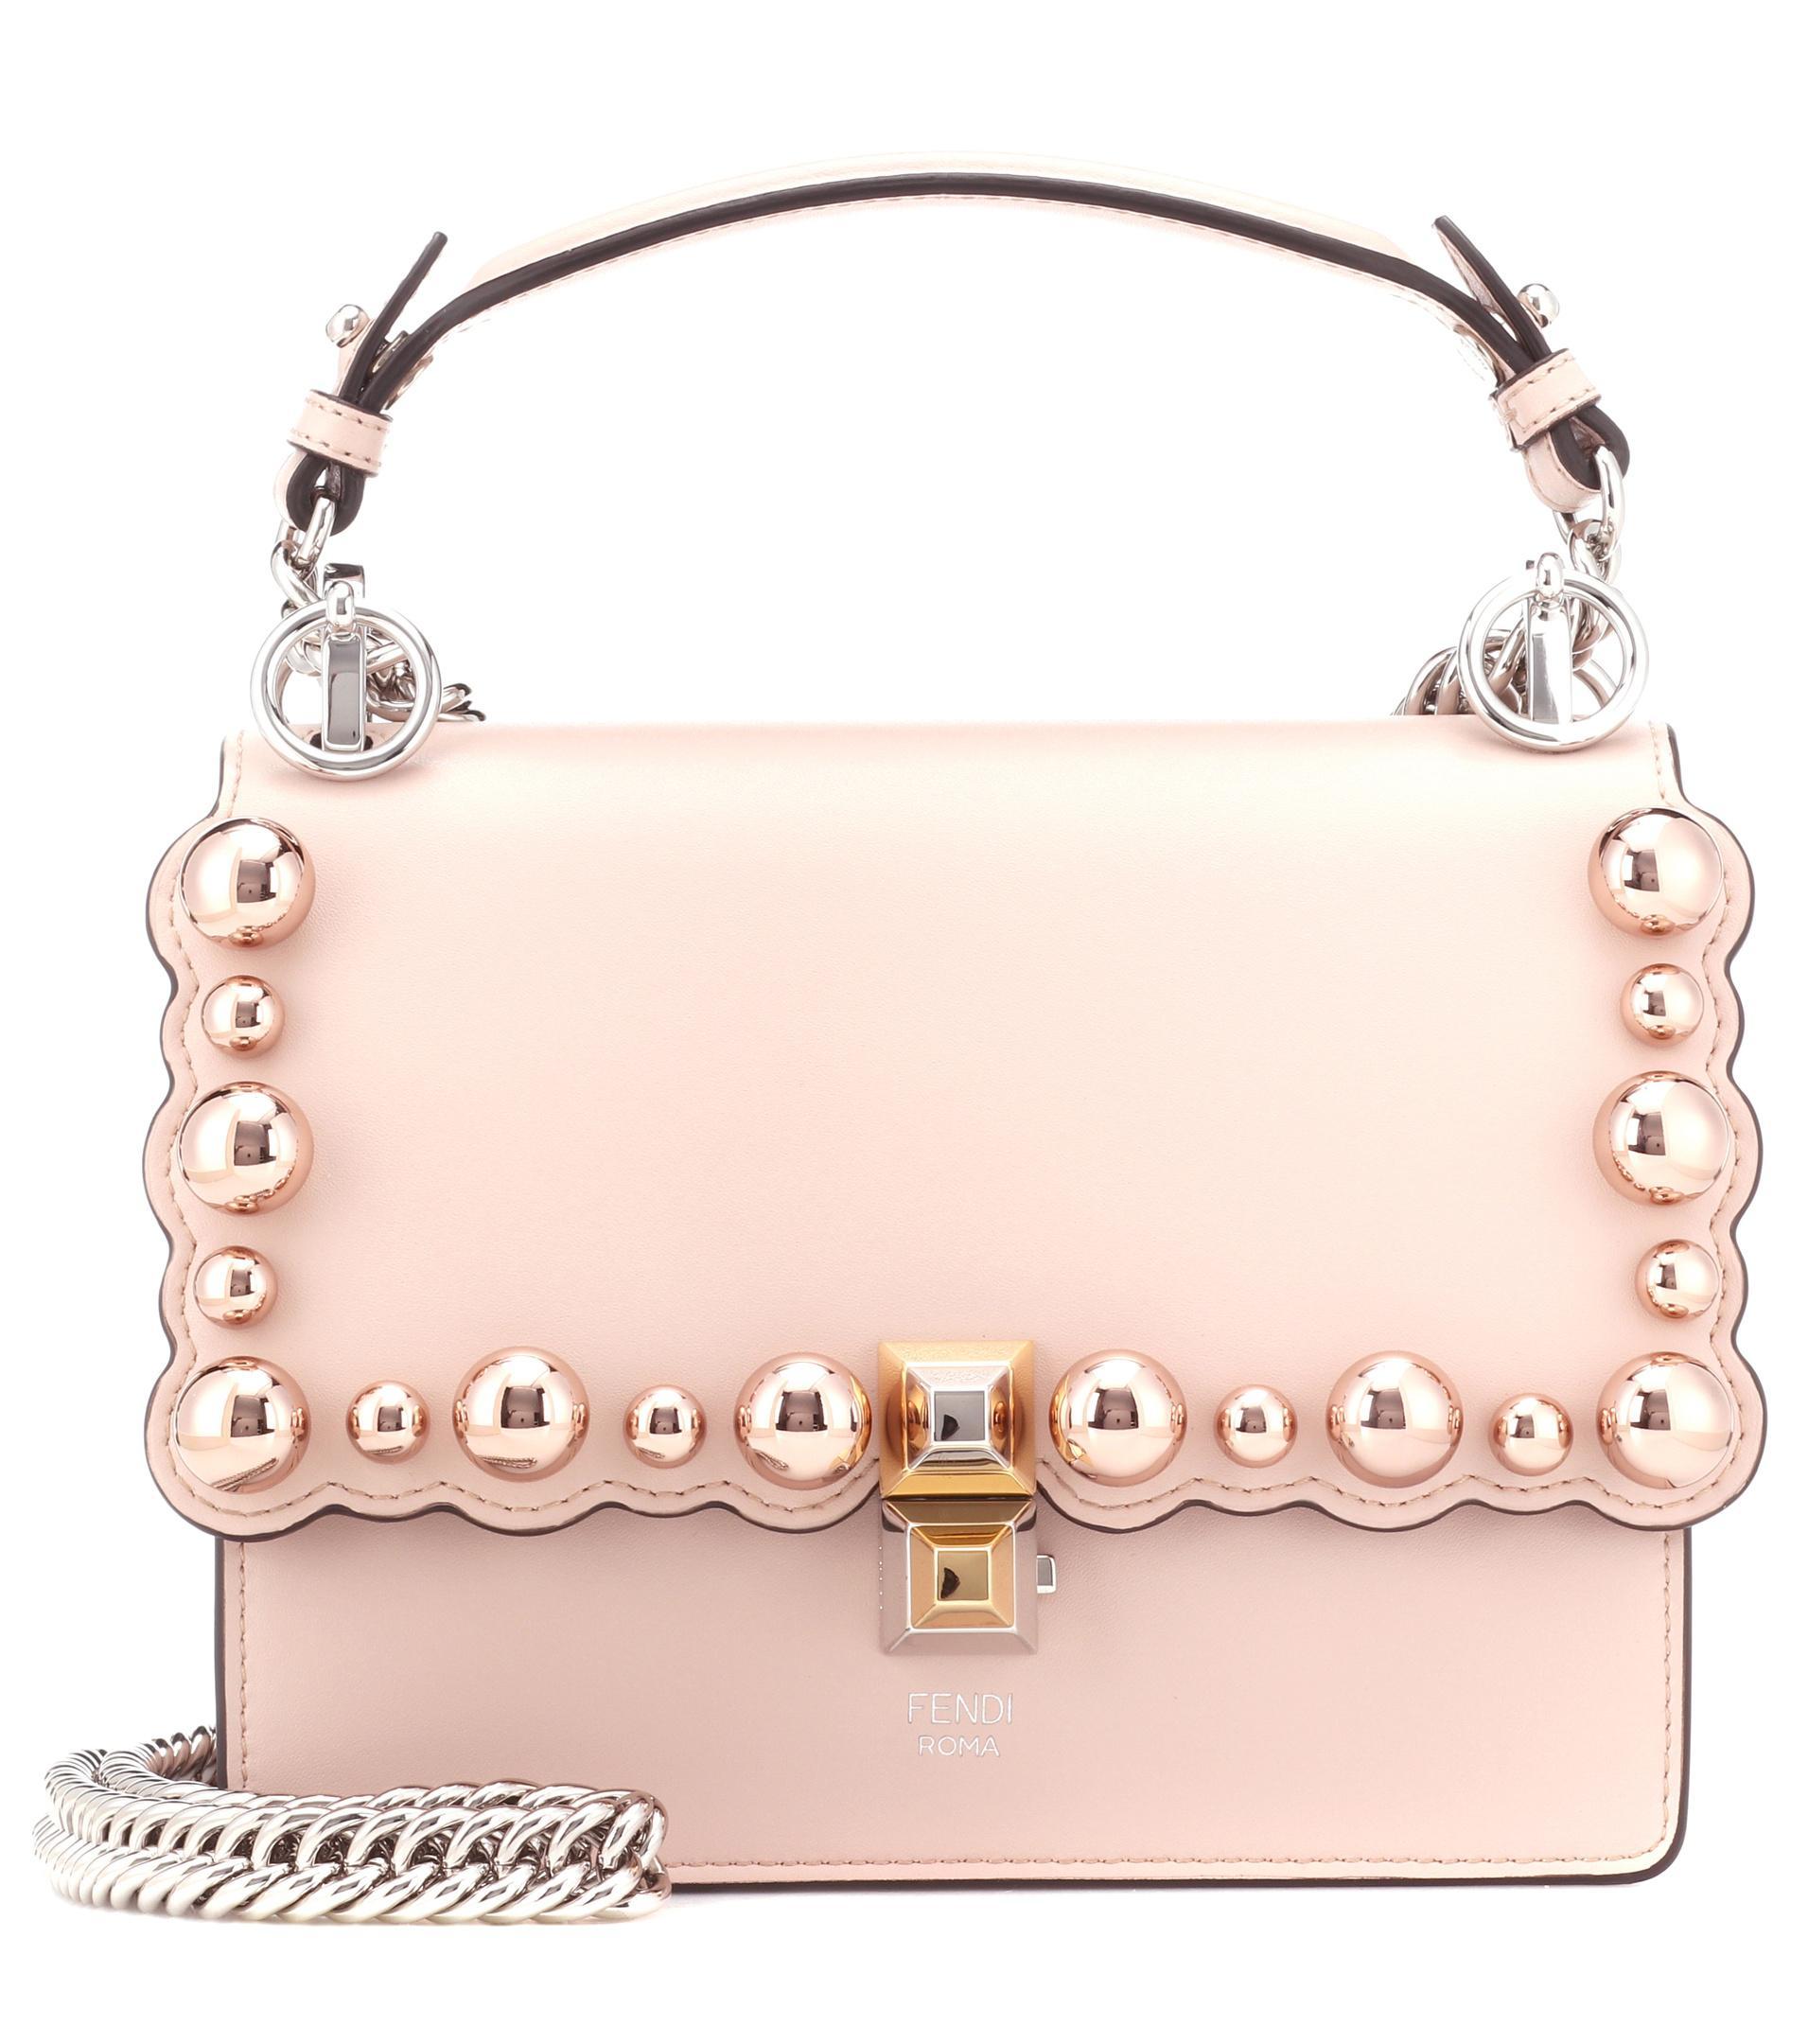 d98c275b6804 Fendi Kan I Mini Leather Shoulder Bag in Pink - Lyst